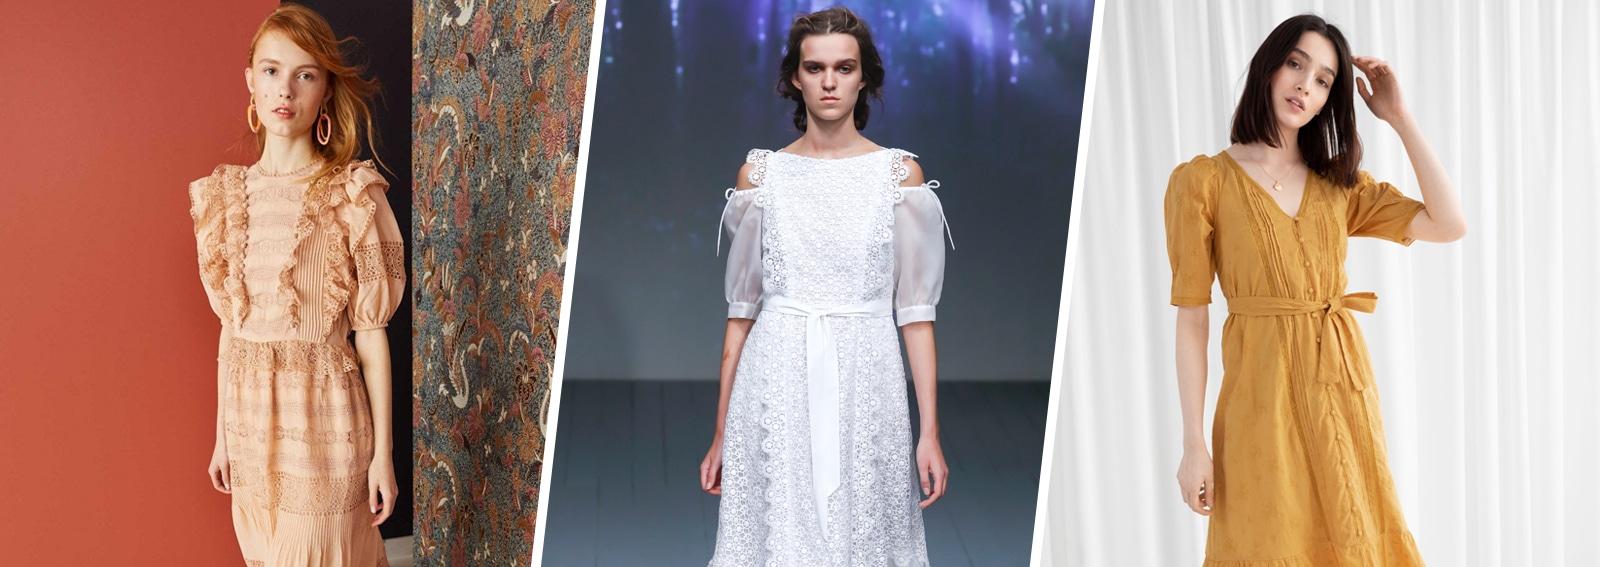 DESKTOP_praire_dress